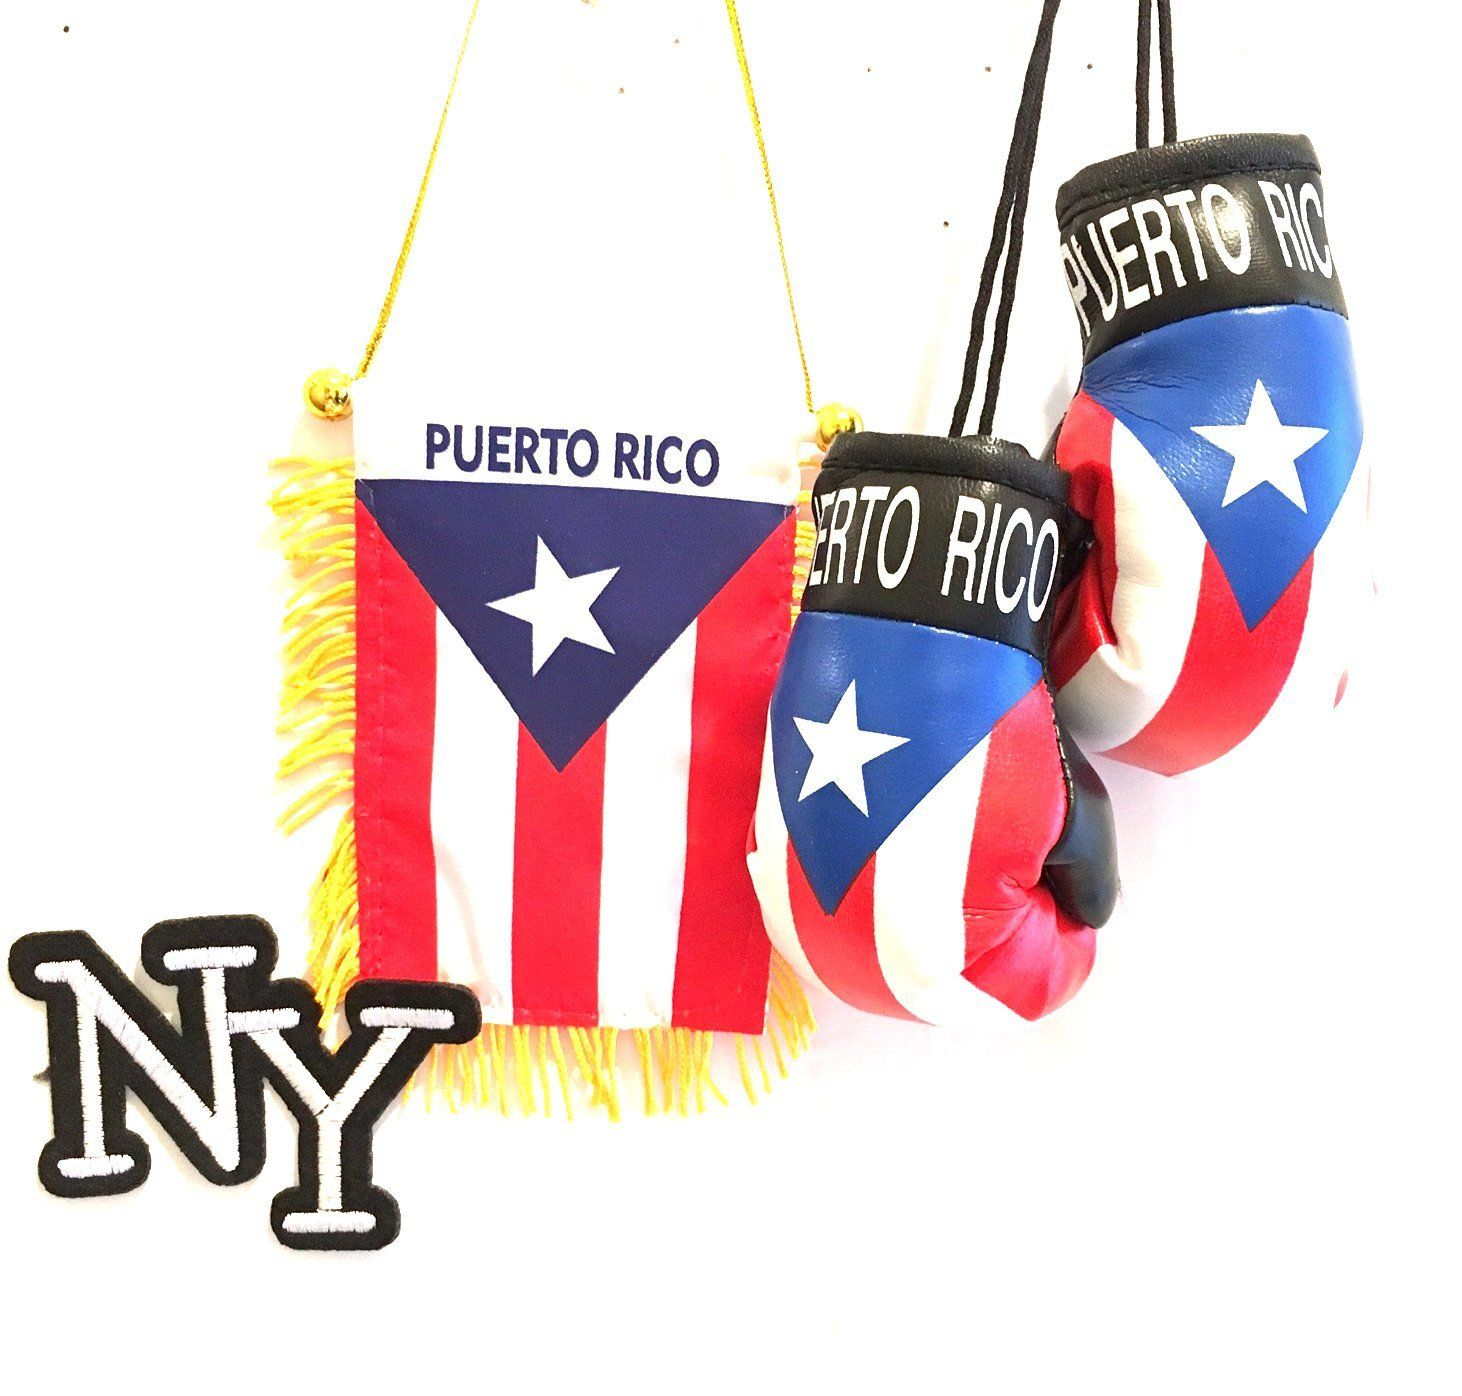 key Chain Puerto Rico Mini Boxing Gloves And Puerto Rico Lanyard